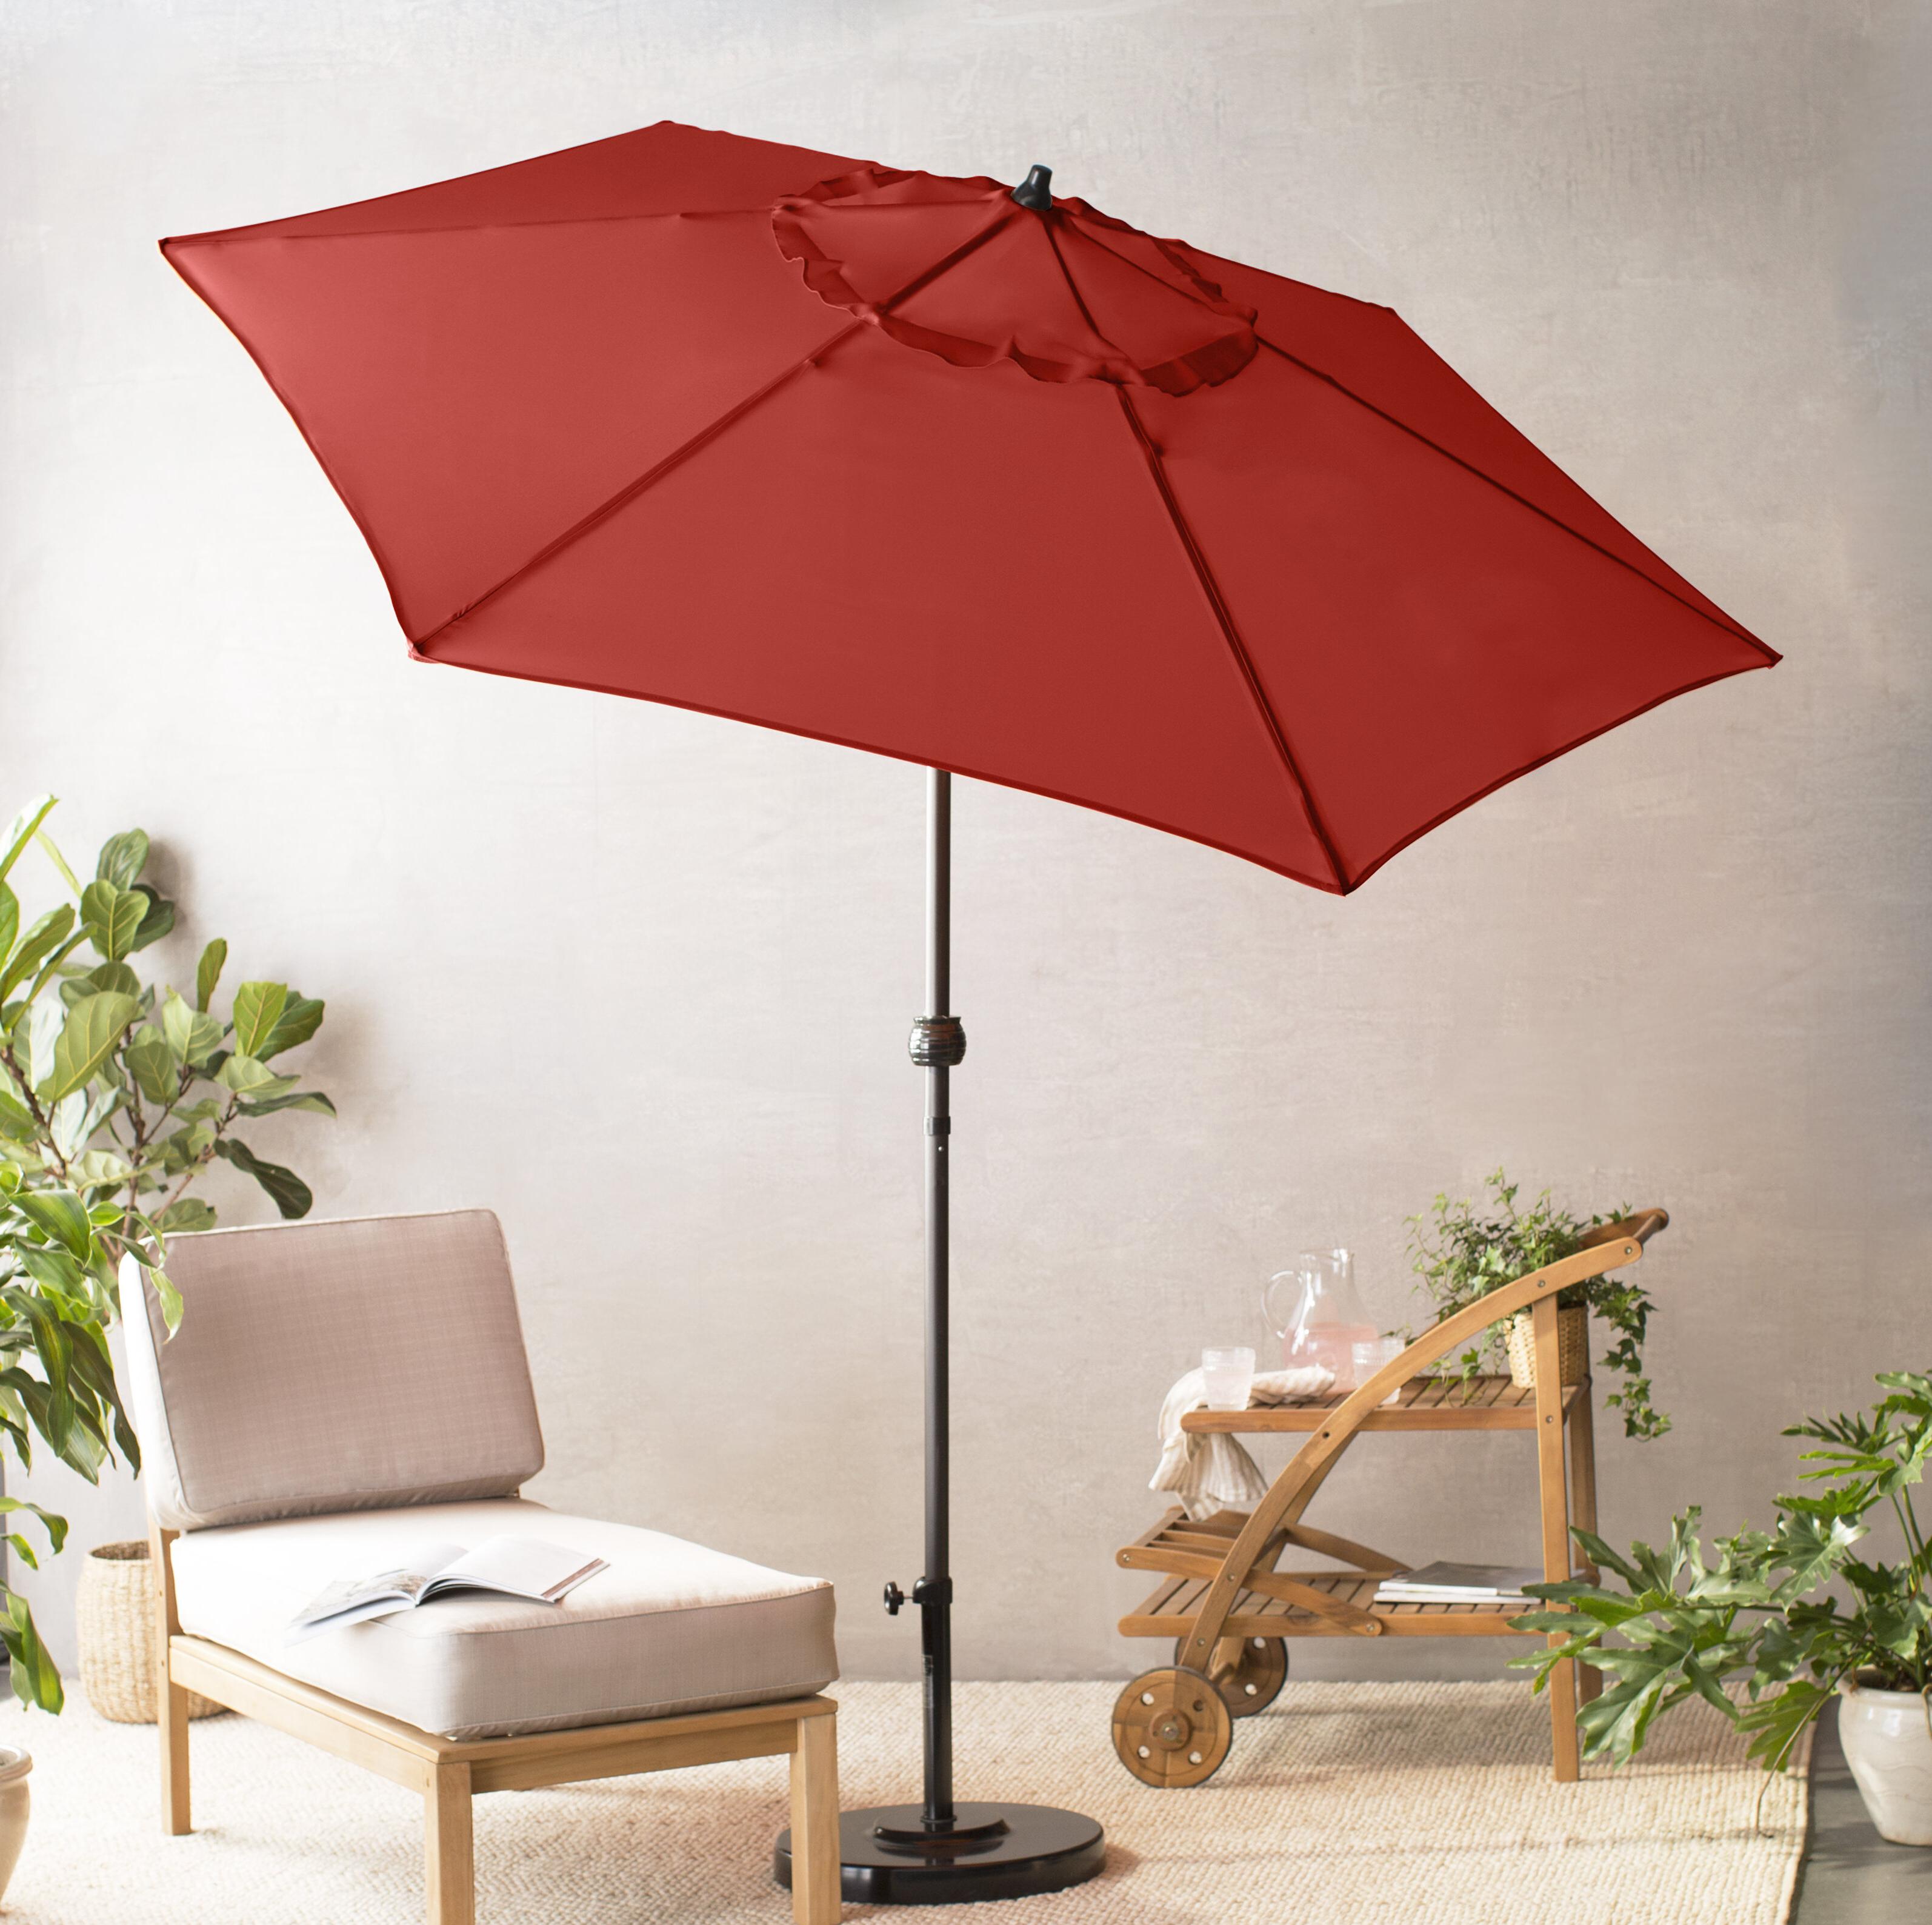 Sittard Market Umbrellas Regarding Well Known Kearney 9' Market Umbrella (View 2 of 20)